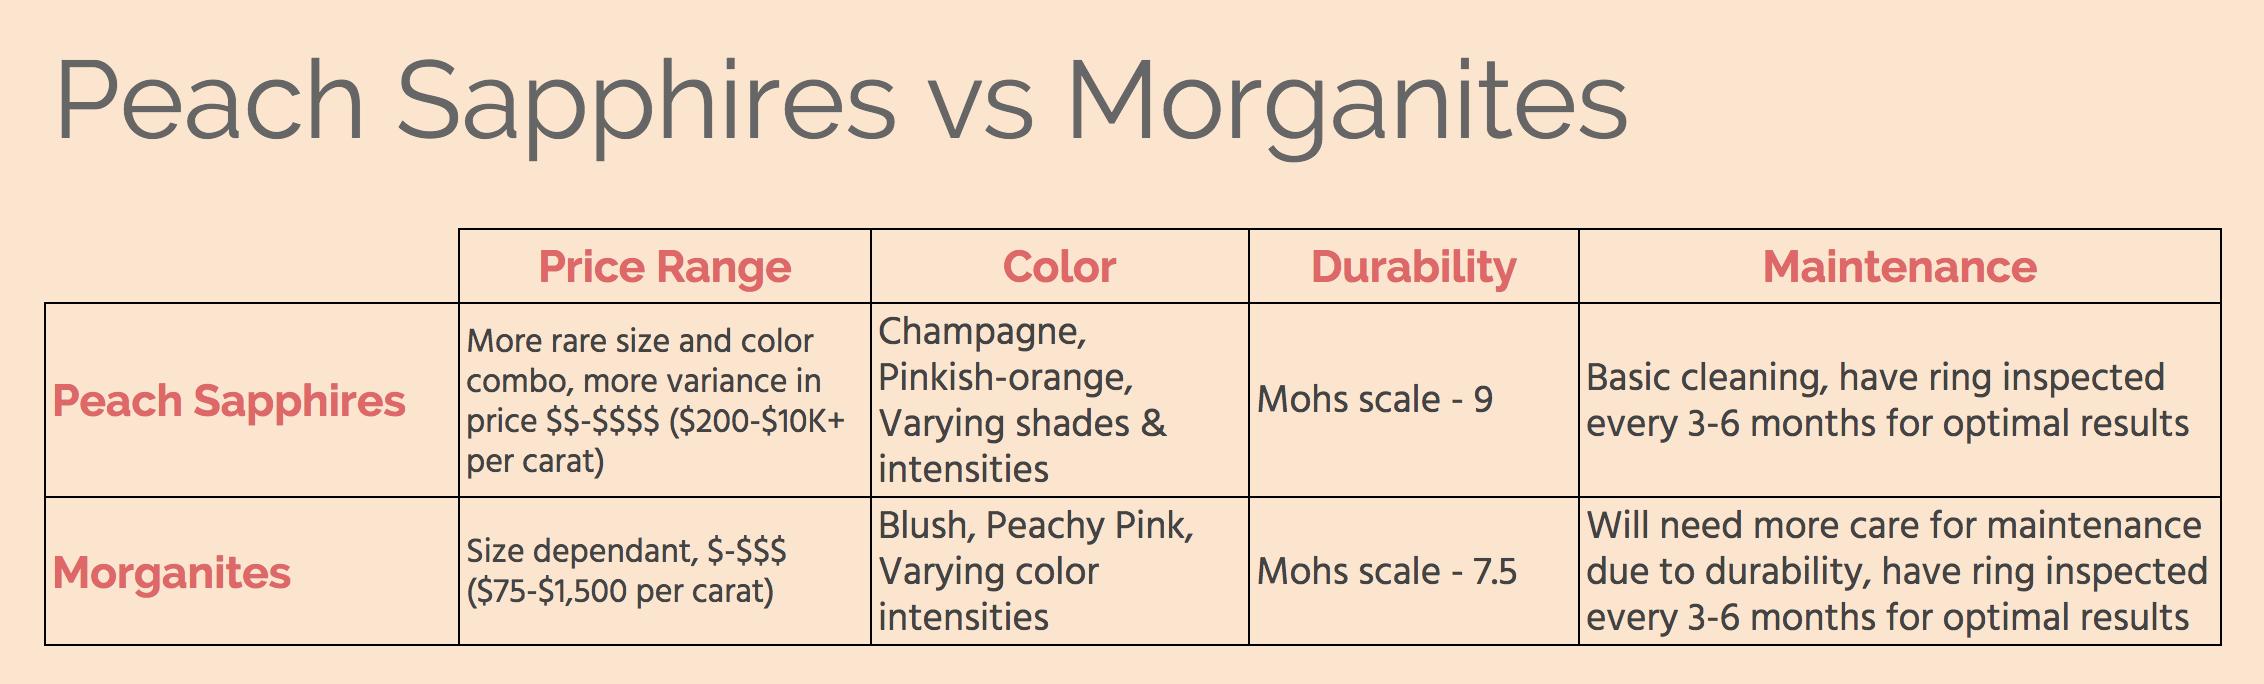 Peach Sapphires vs Morganites comparison chart.